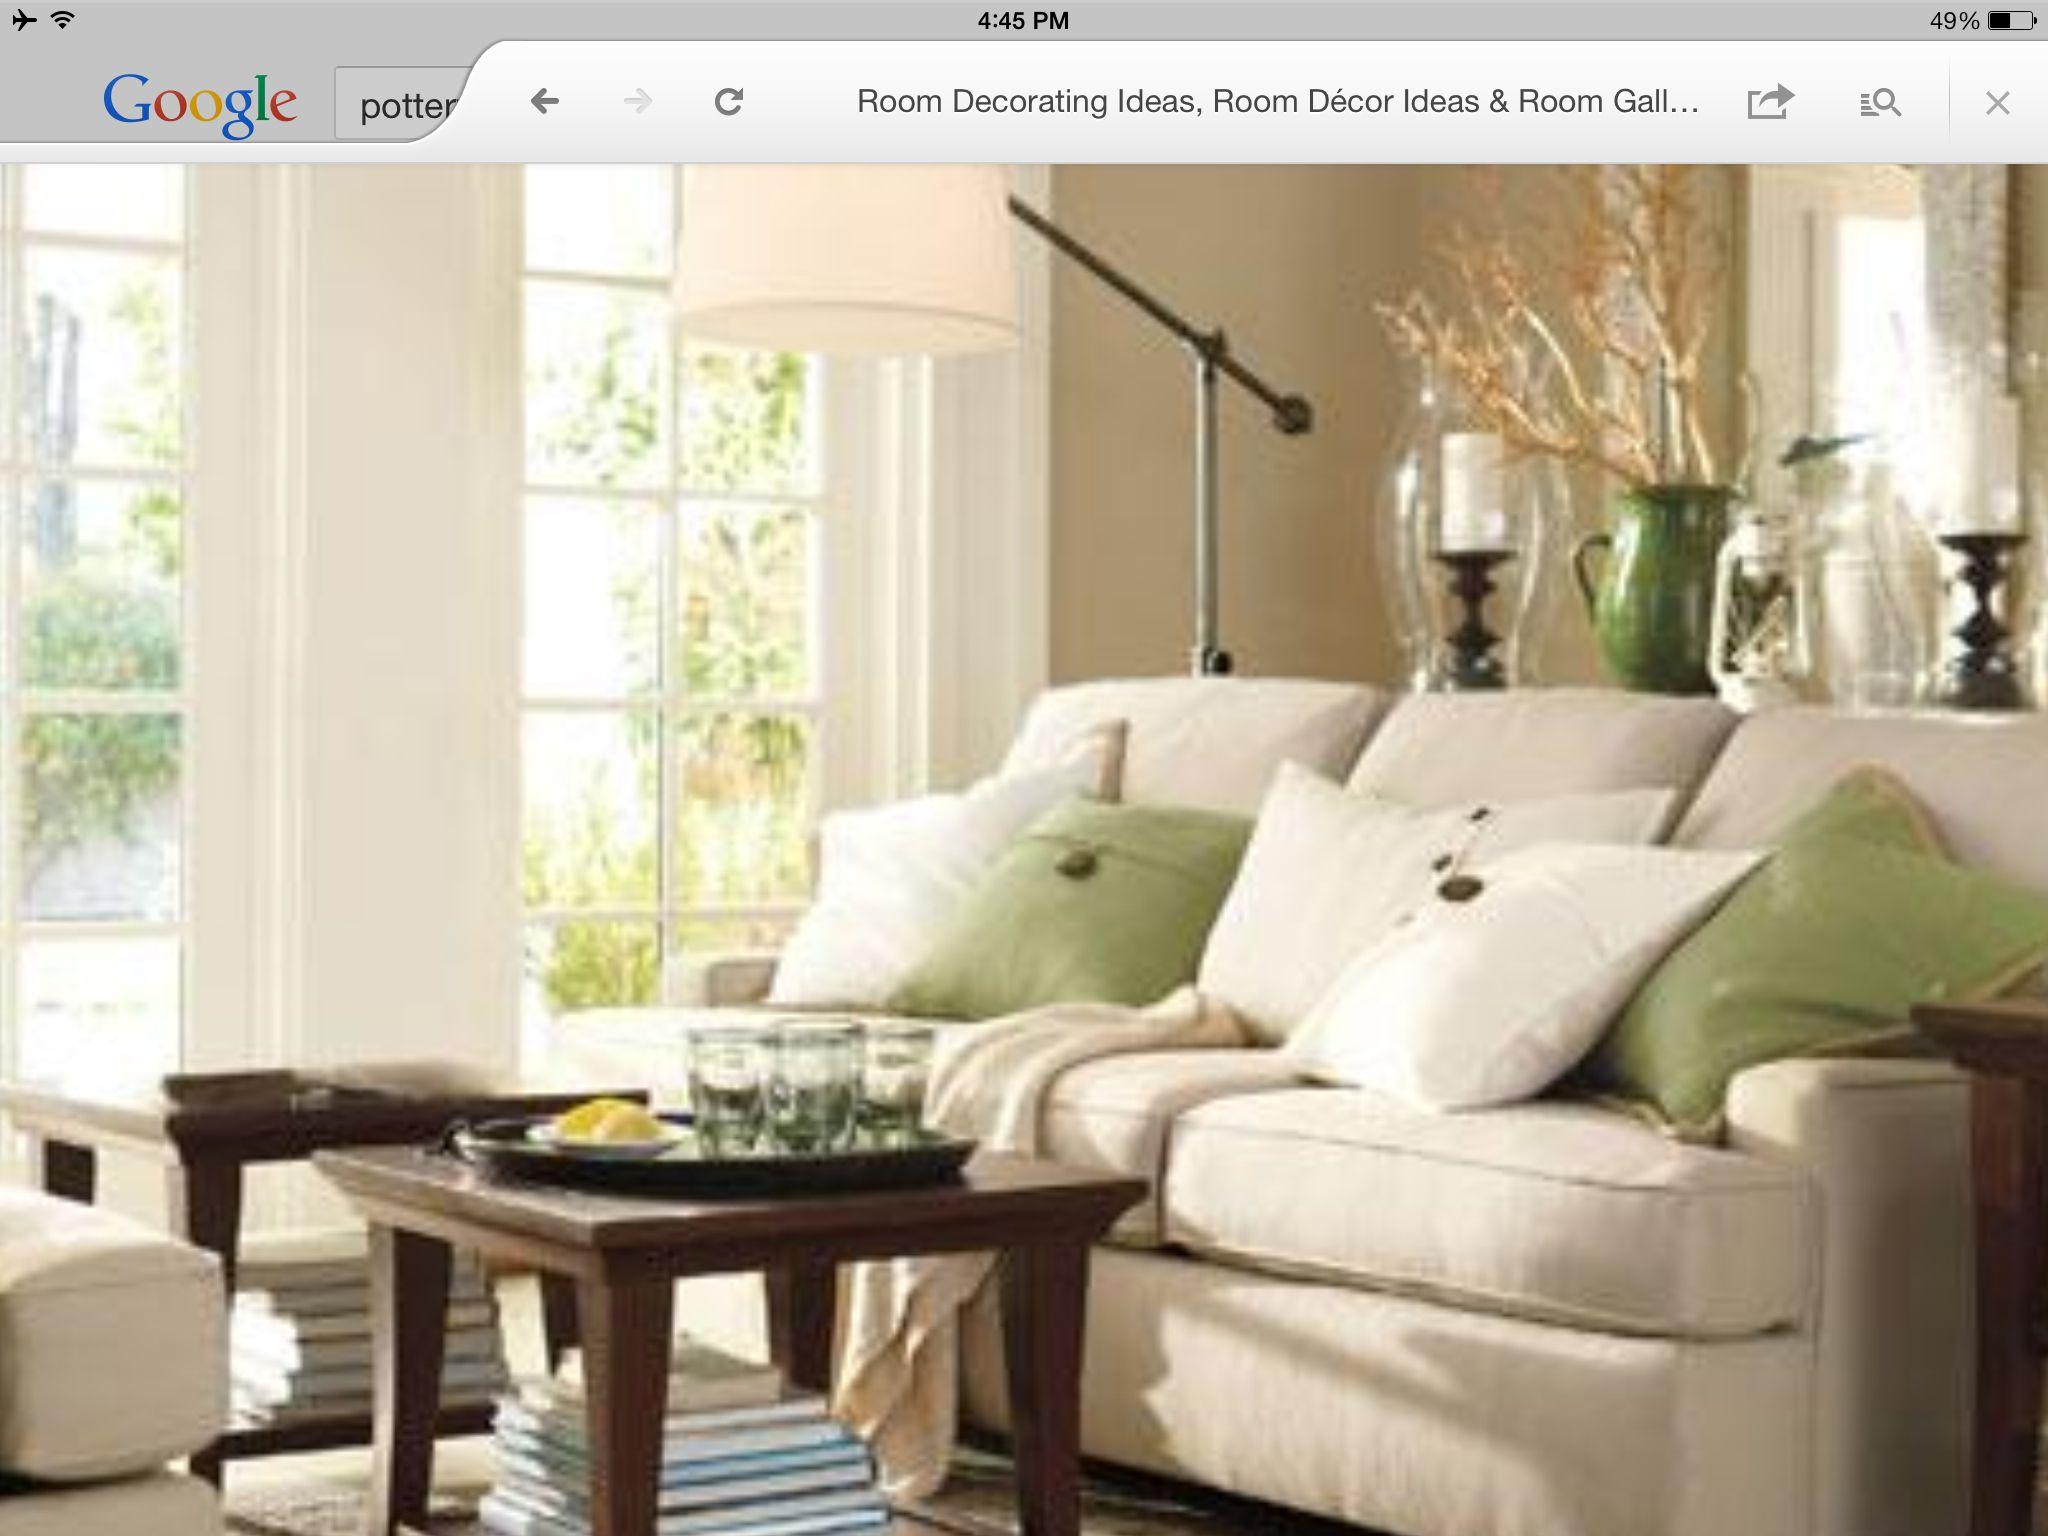 Pin by Terry Kessler on Interior design | Pinterest | Shabby and ...